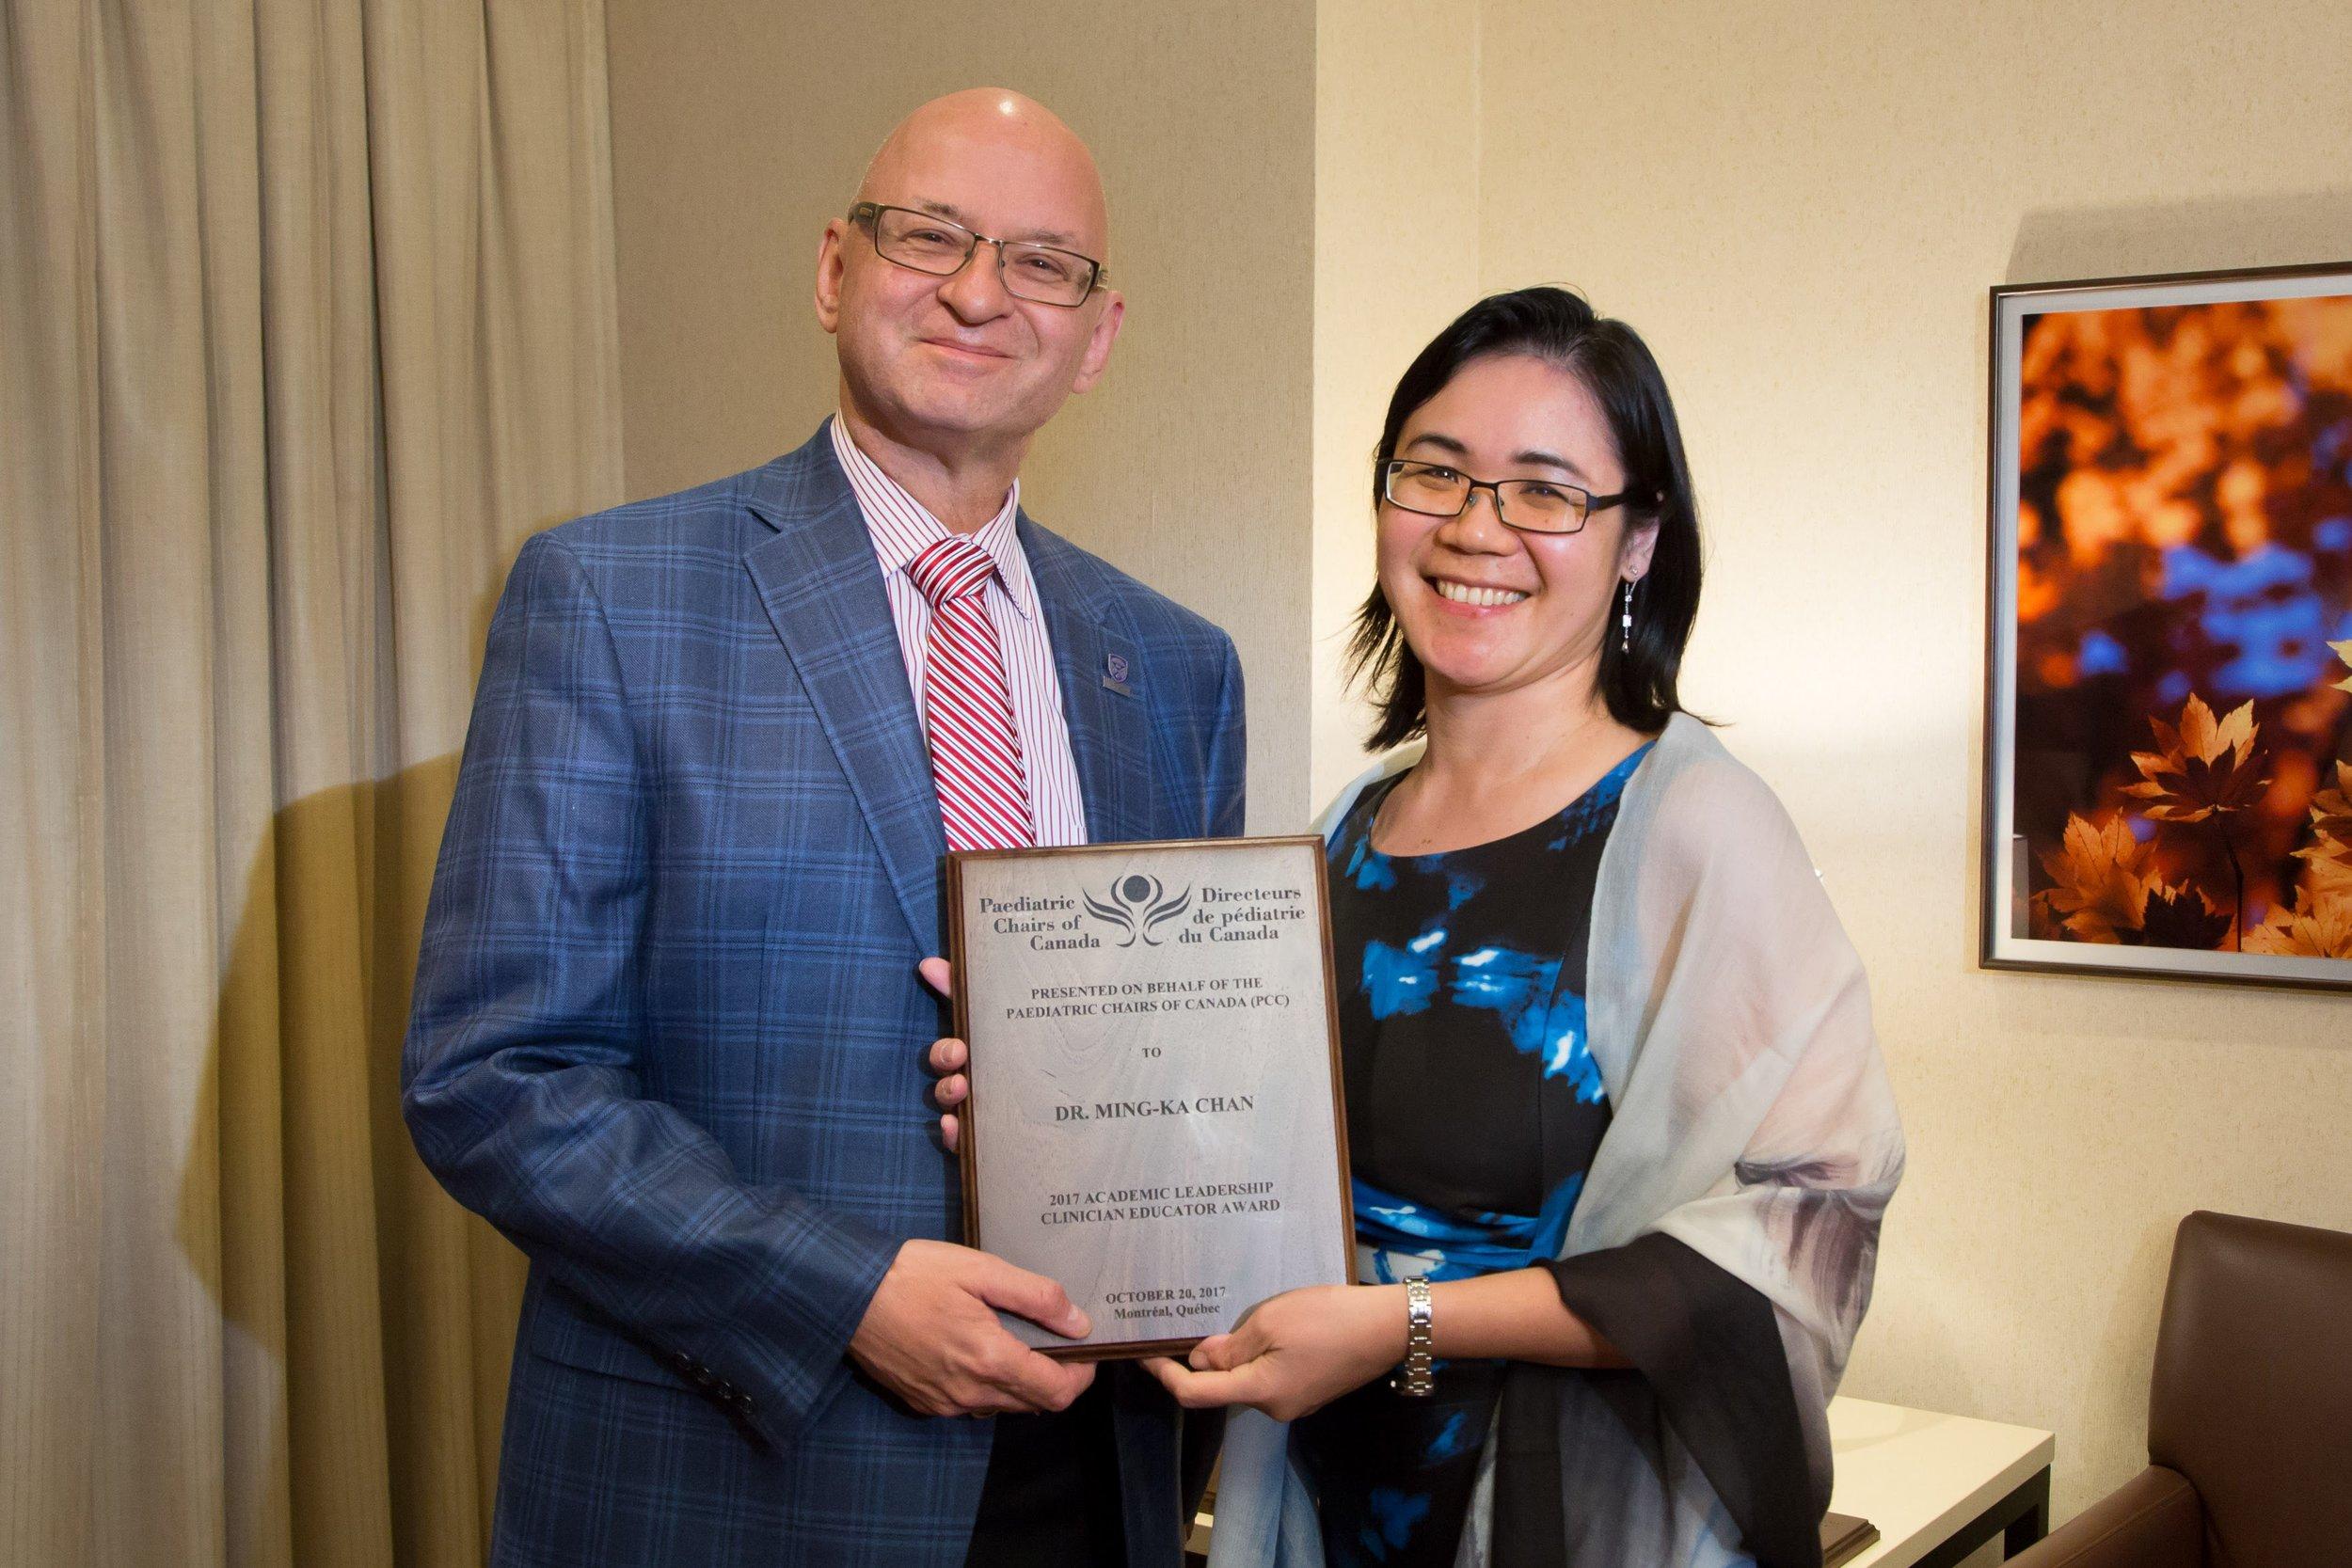 Dr. Michael Rieder (University of Western Ontario  on behalf of Dr. Terry Klassen, University of Manitoba ) and Dr. Ming-Ka Chan (University of Manitoba).